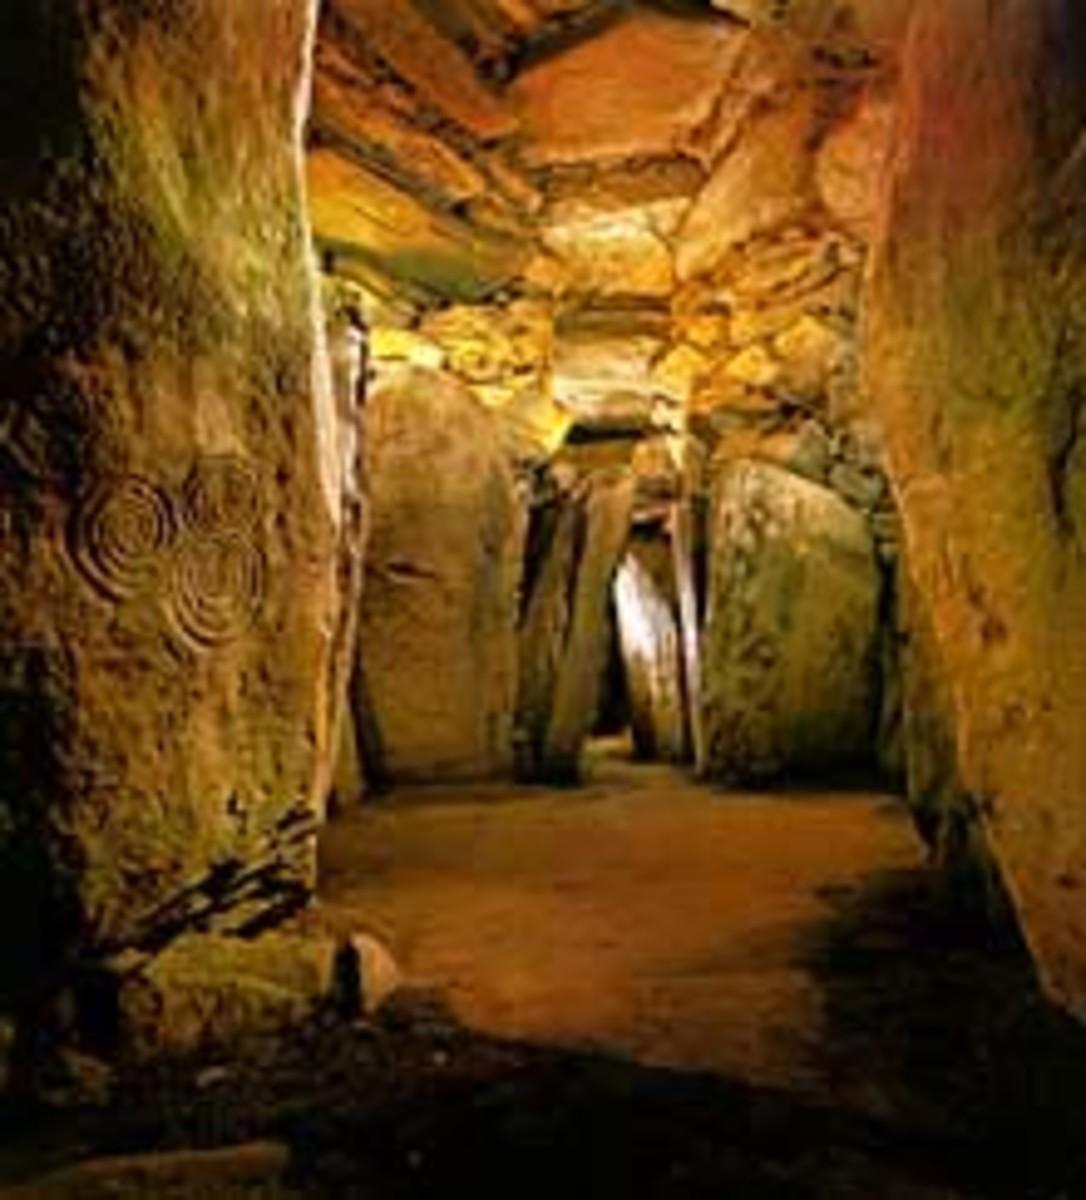 Inside the chamber at Newgrange.